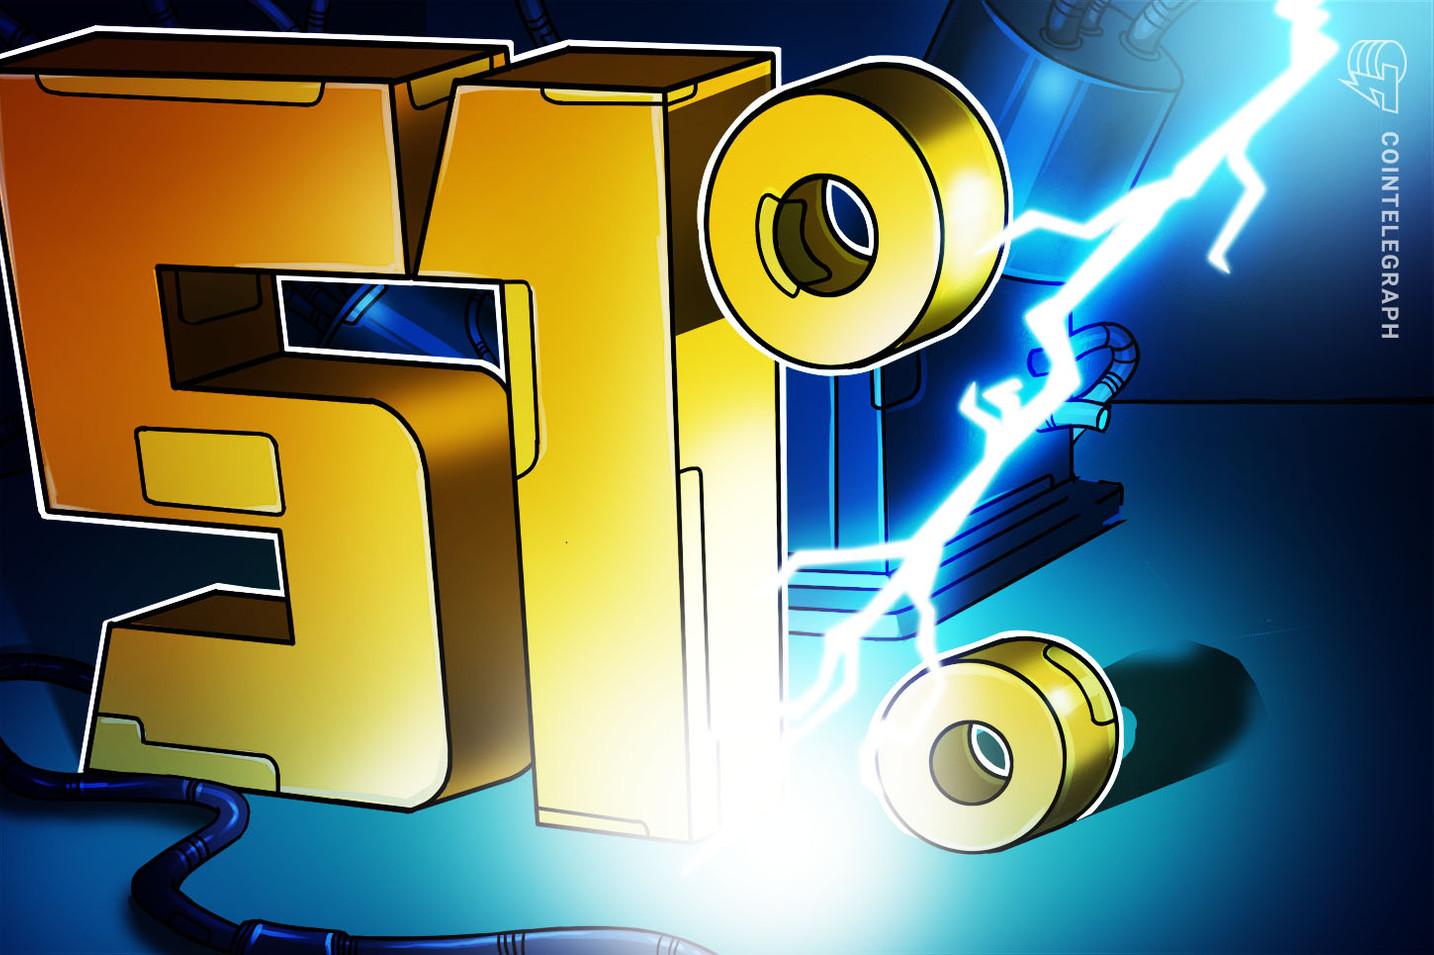 Bitcoin Core-Entwickler: Maßnahmen gegen 51-Prozent-Angriffe umfassen immer Zentralisierung